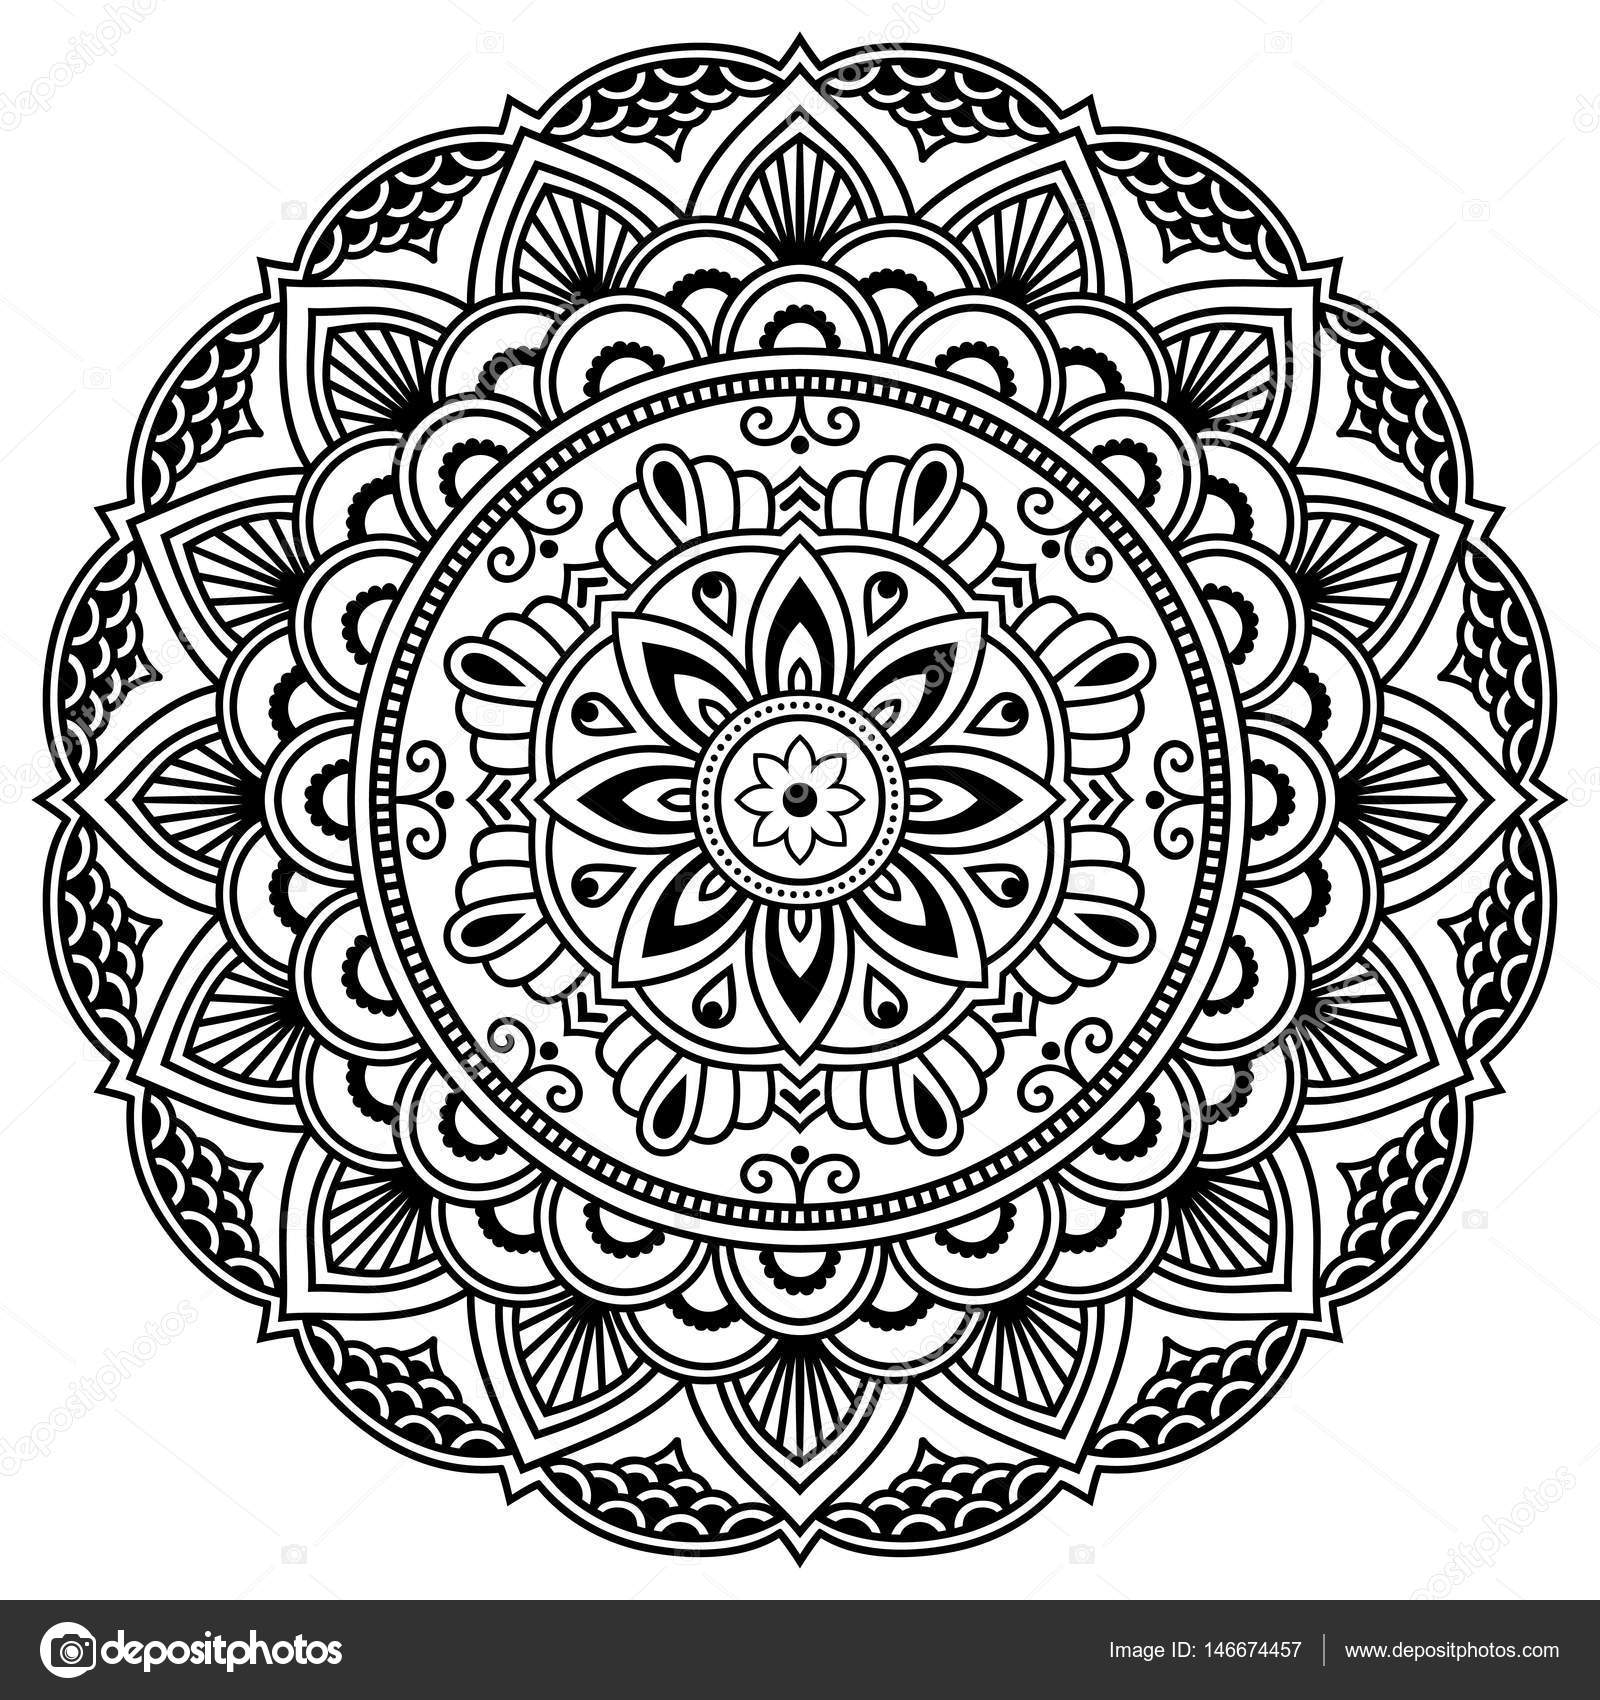 Henna Tattoo Mandala. Mehndi-Stil. Dekorative Muster im ...